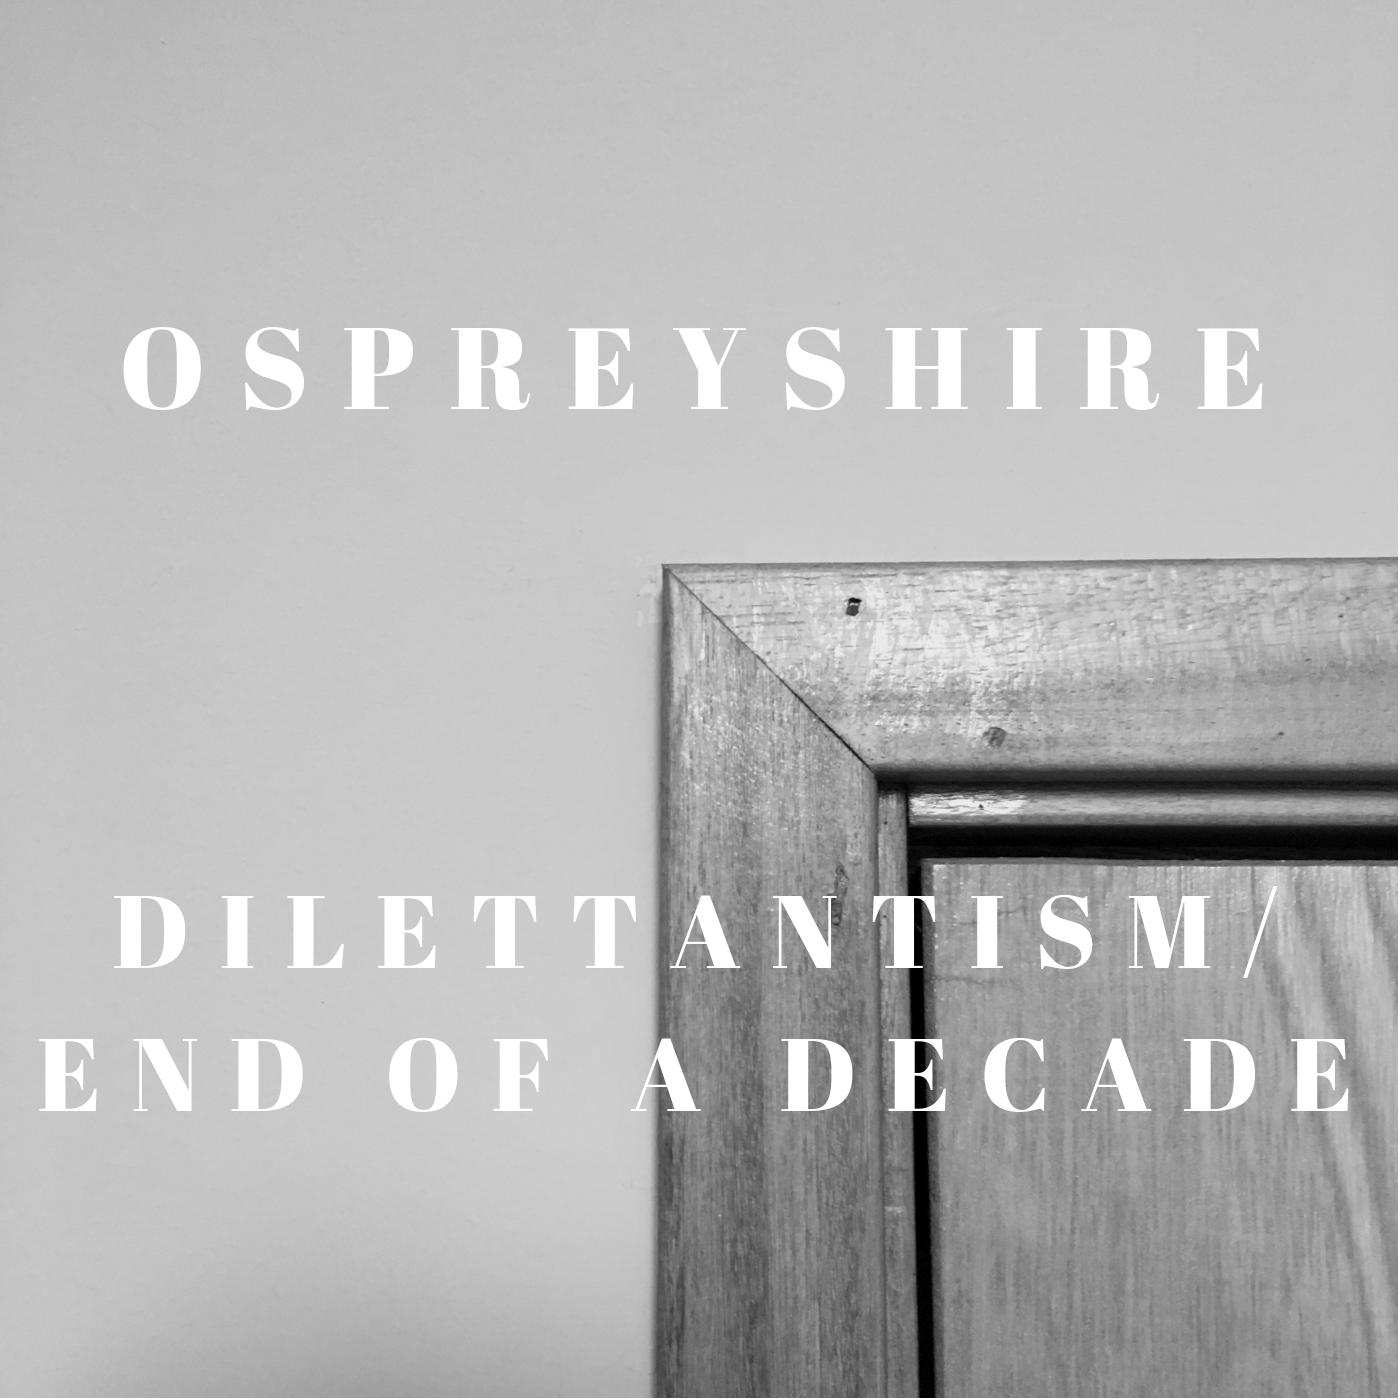 Ospreyshire Diletantism